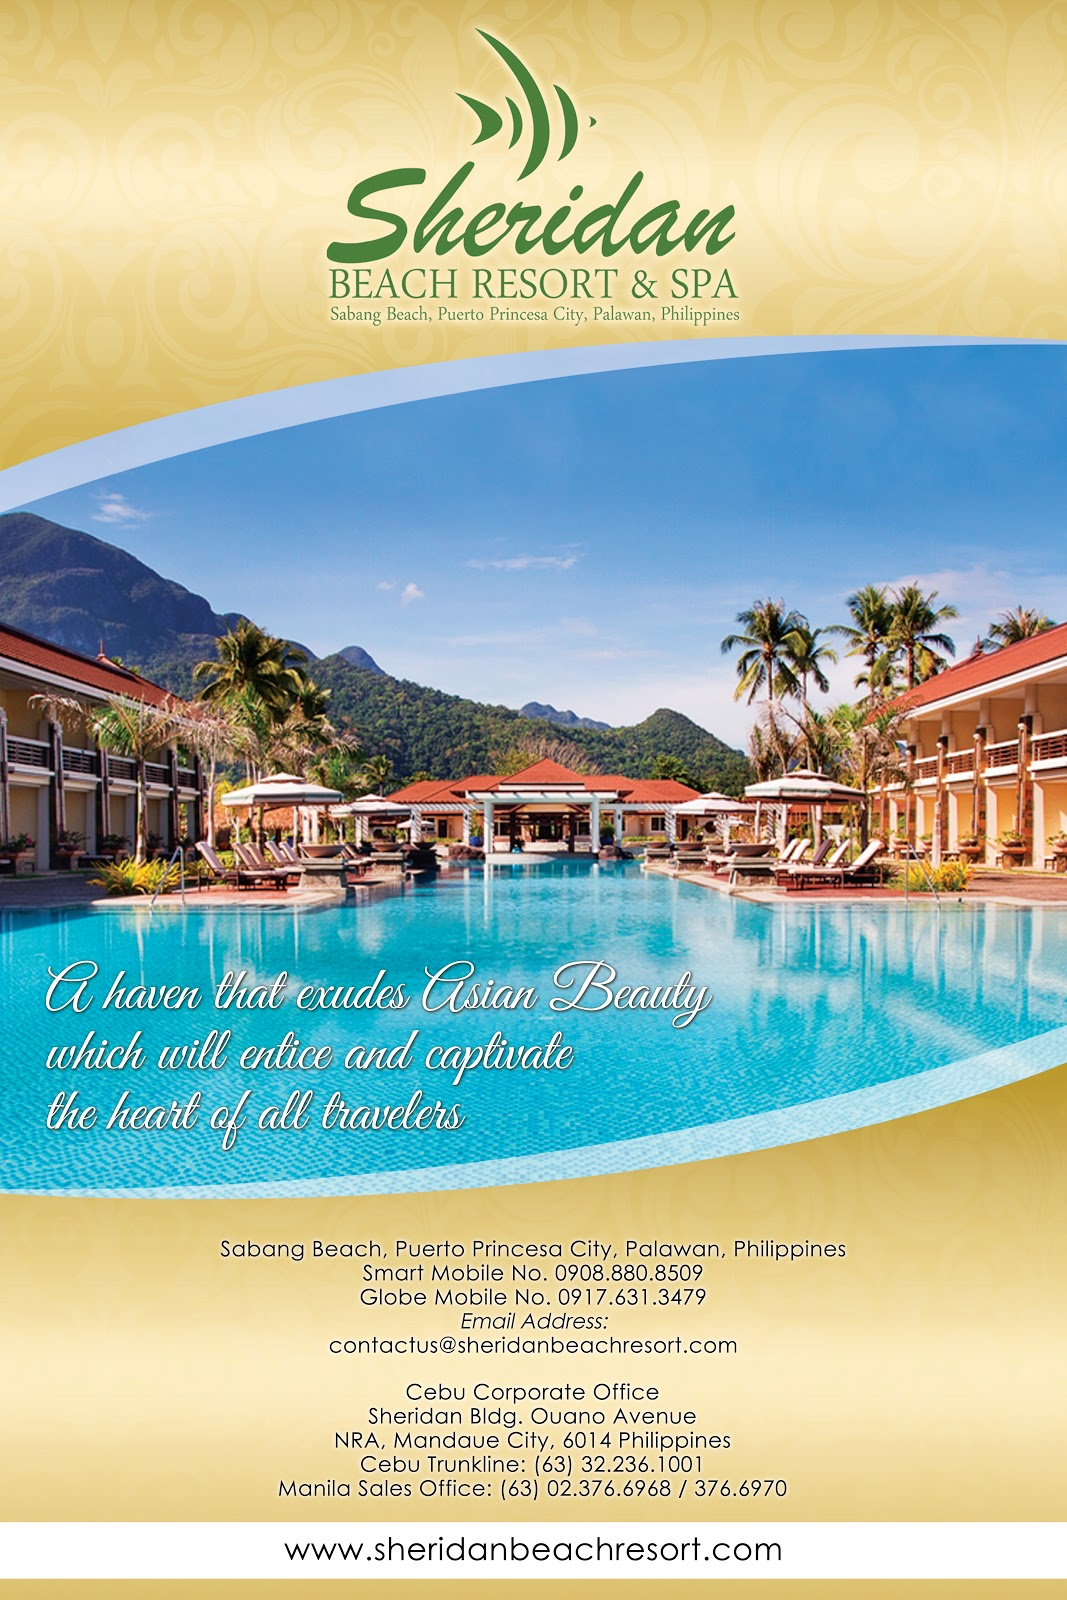 Cheap Alternative Trip To Sheridan Beach Resort And Spa